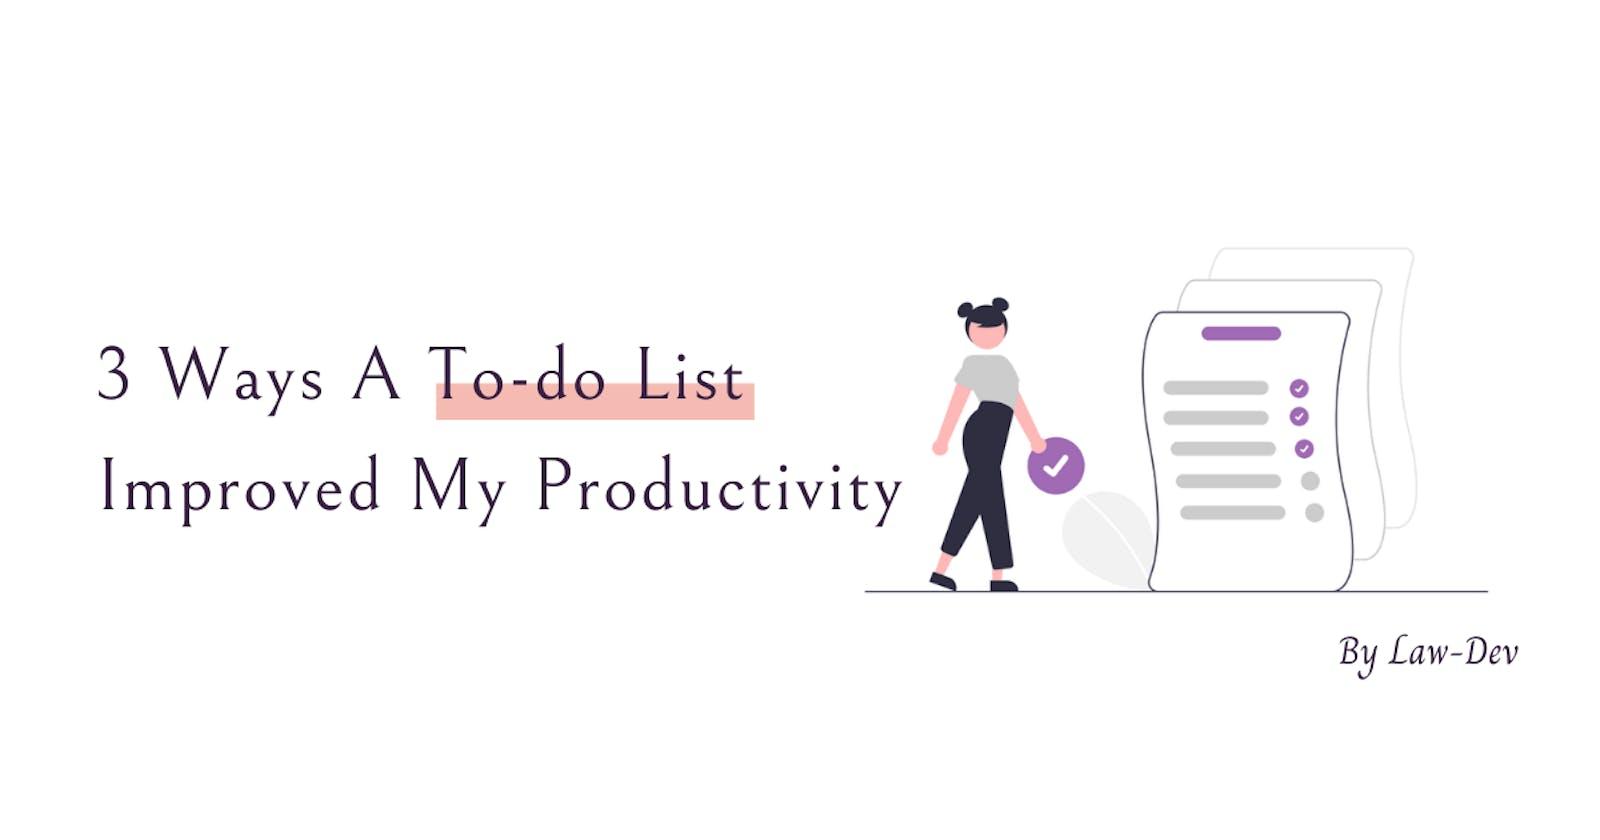 3 Ways A To-do List Improved my Productivity